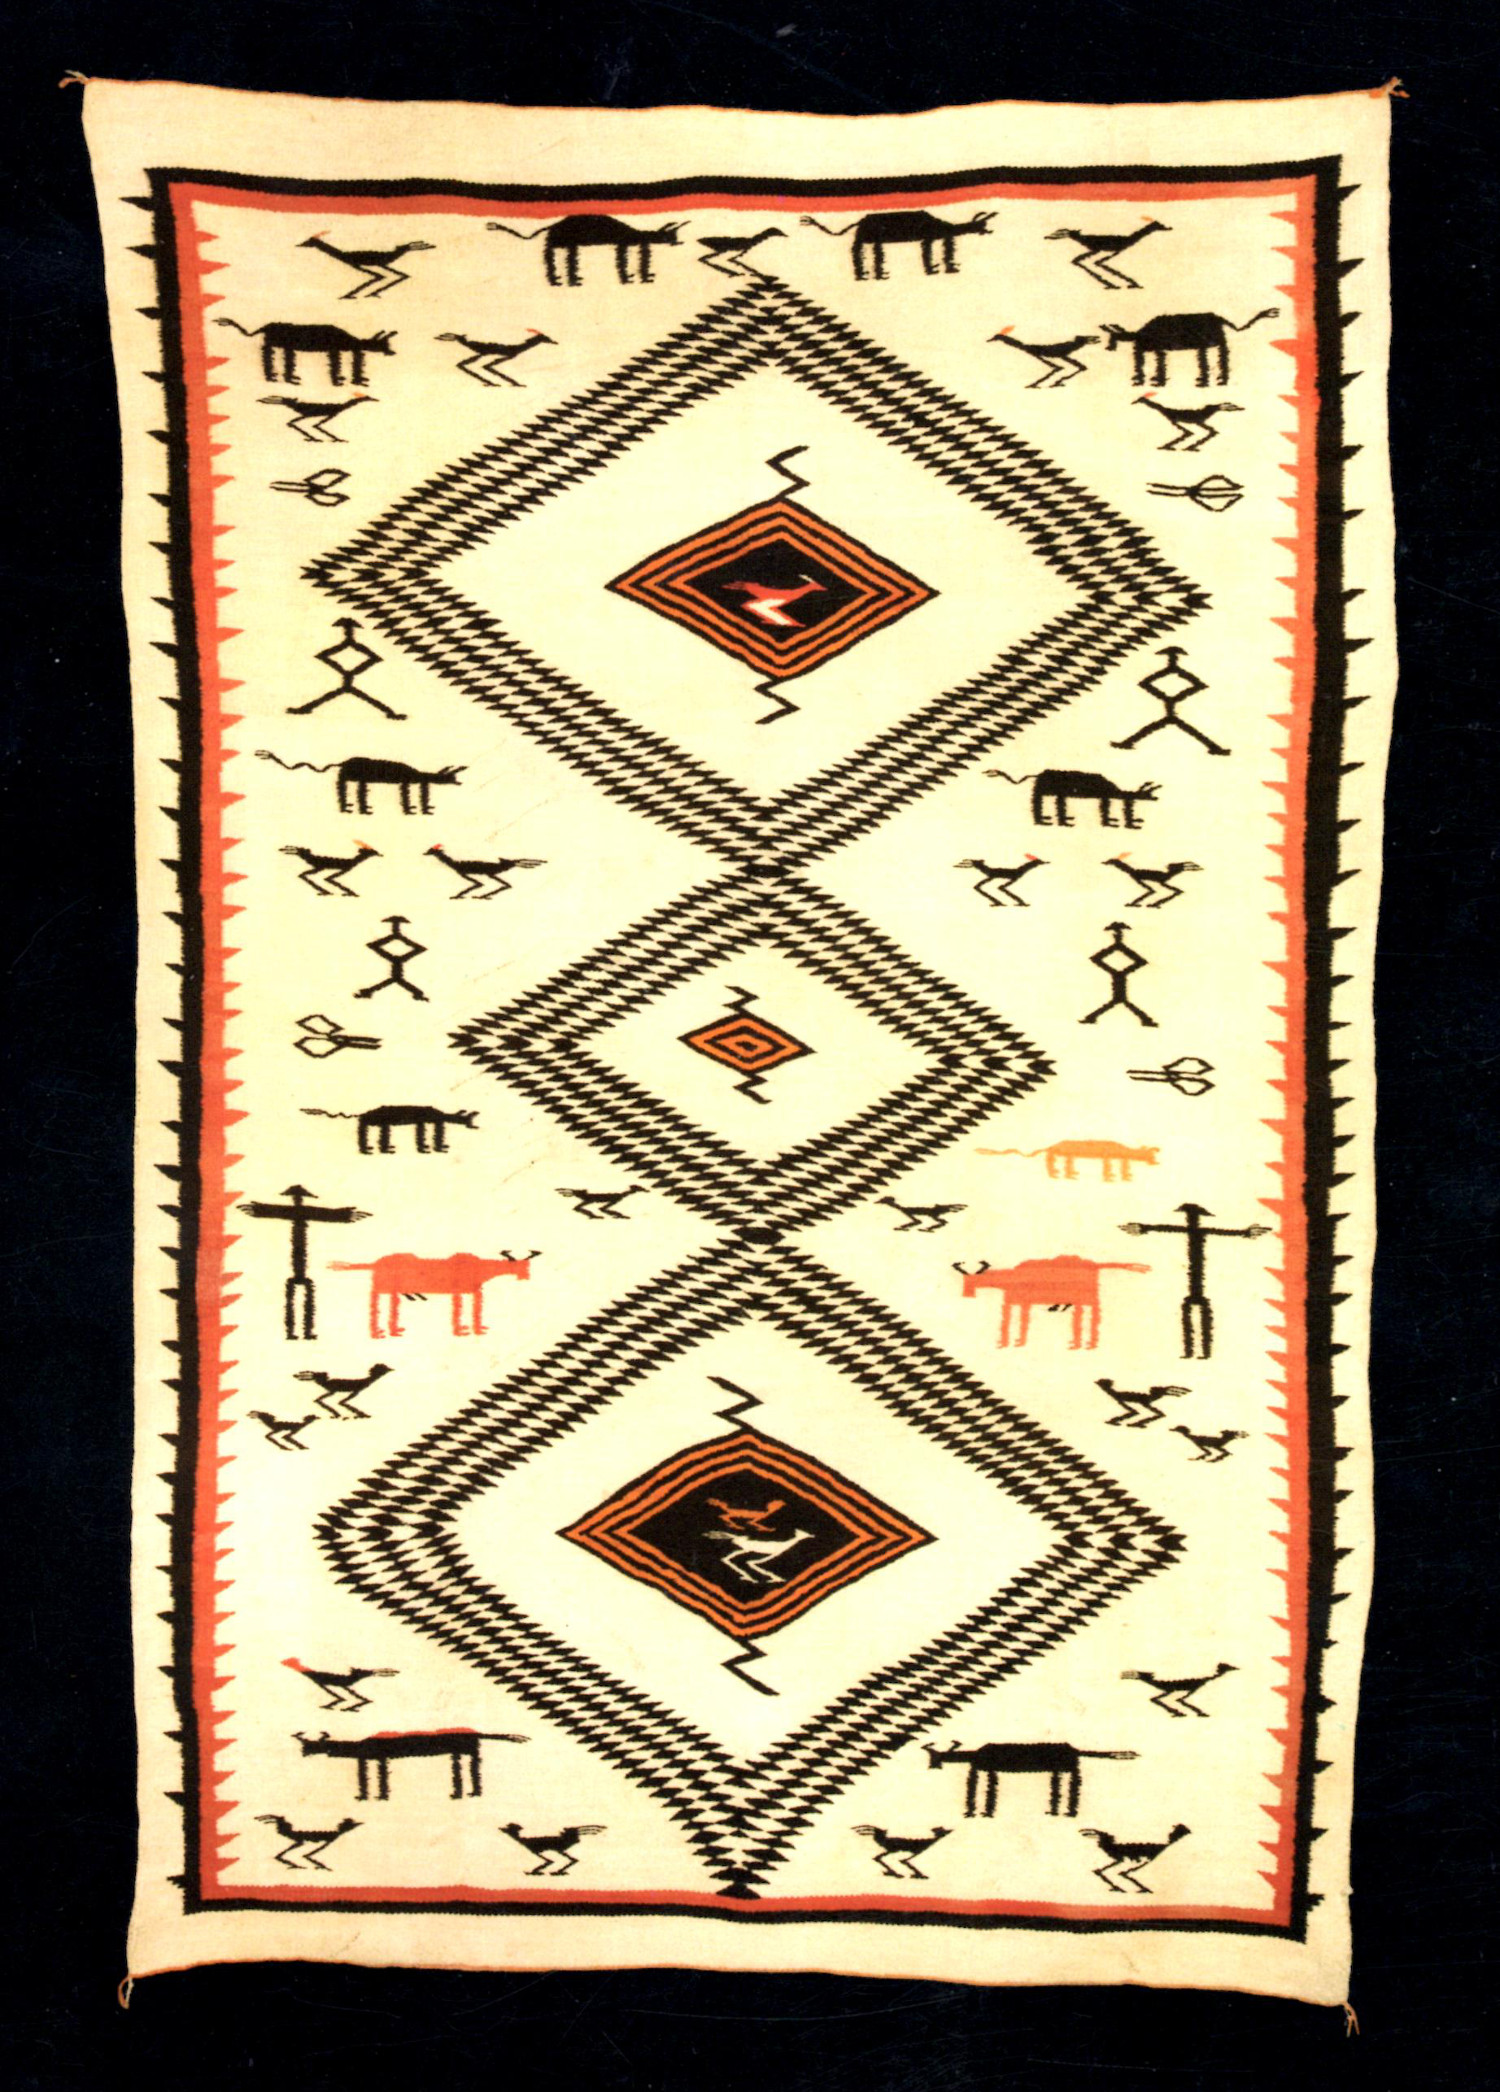 multiple-pictorial-transitional-yarn-blanket.jpg